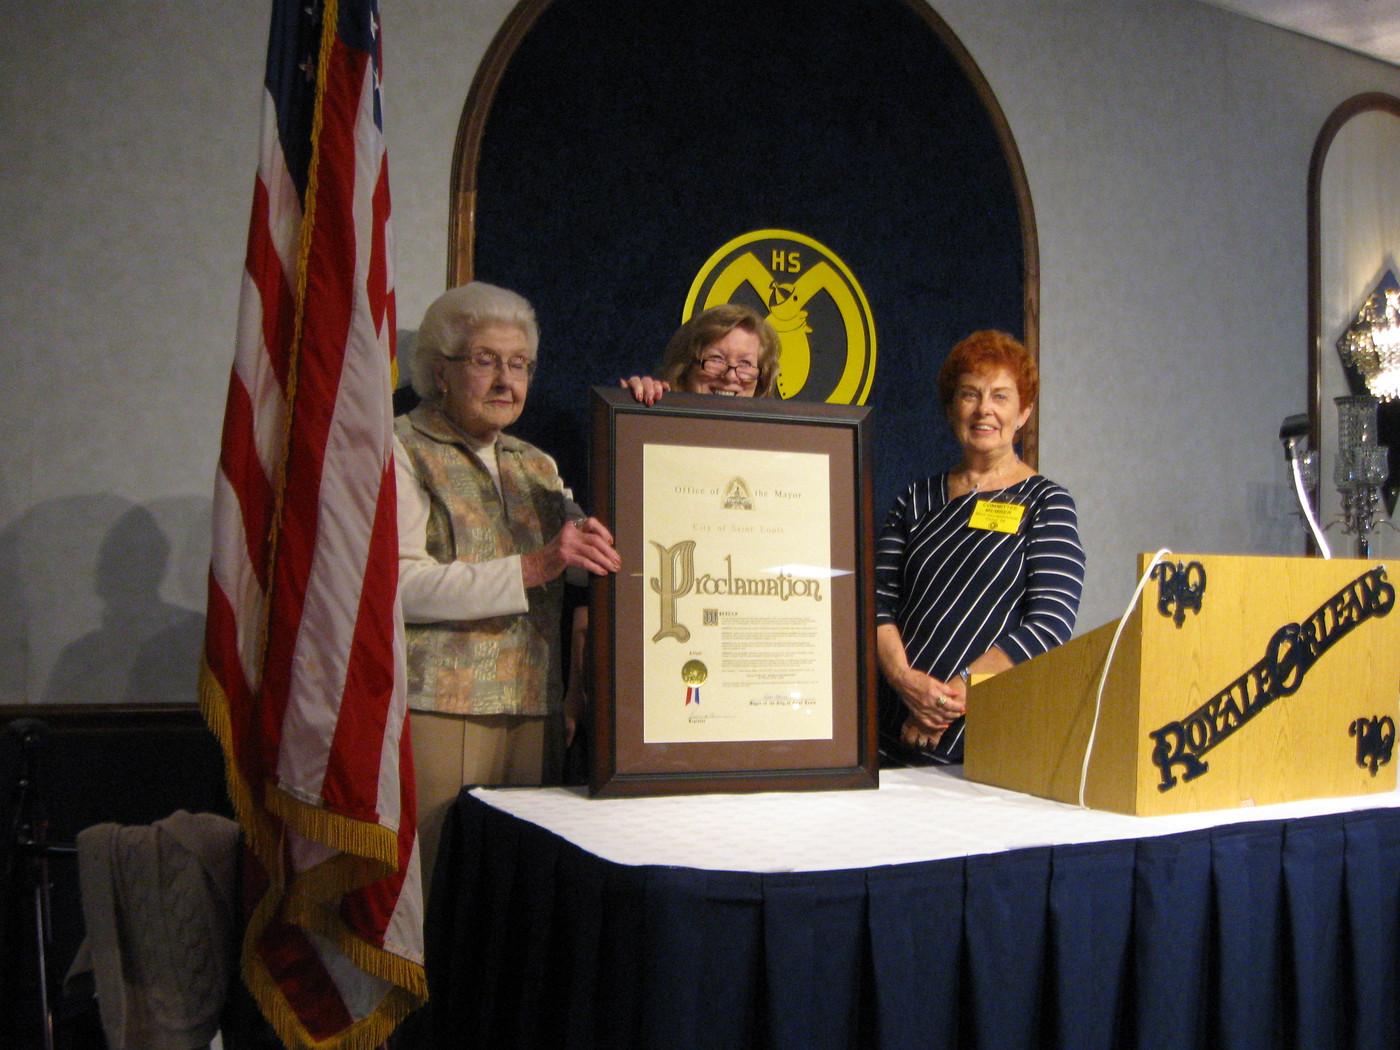 Dee Jay Mueller, Pat Wiseman, Mary Gabel